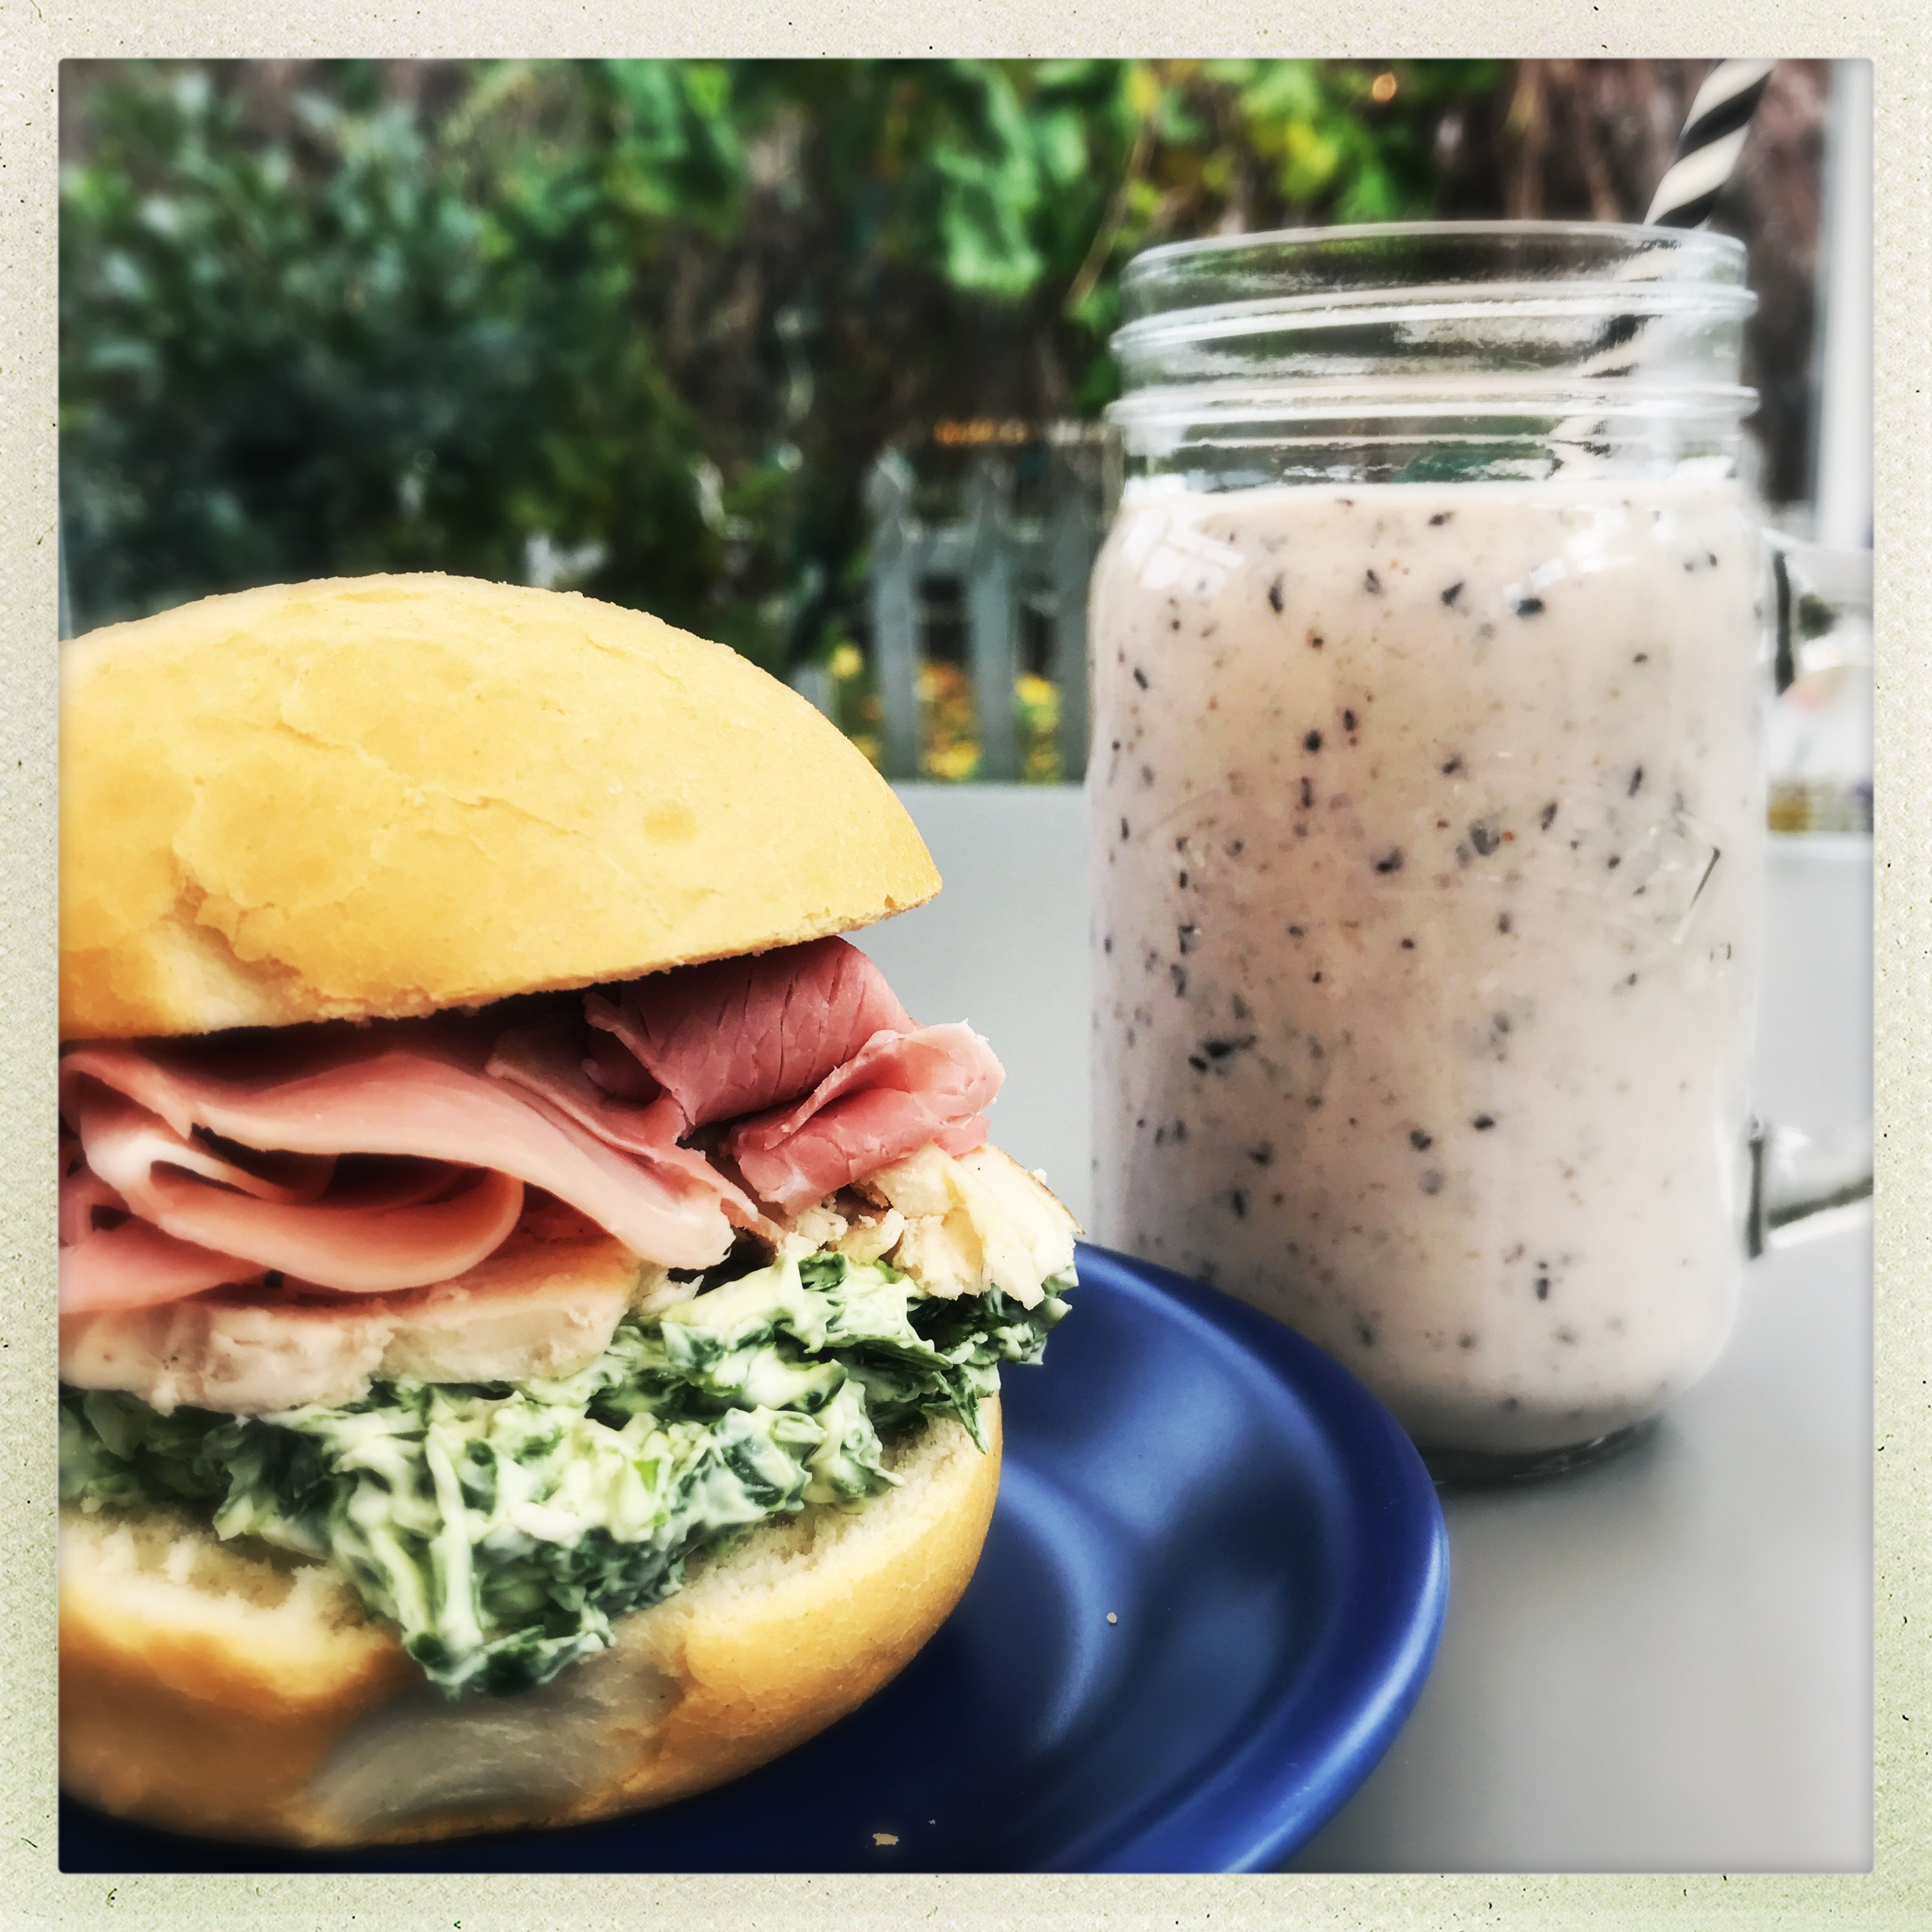 Ham, spinach and cream cheese sandwich